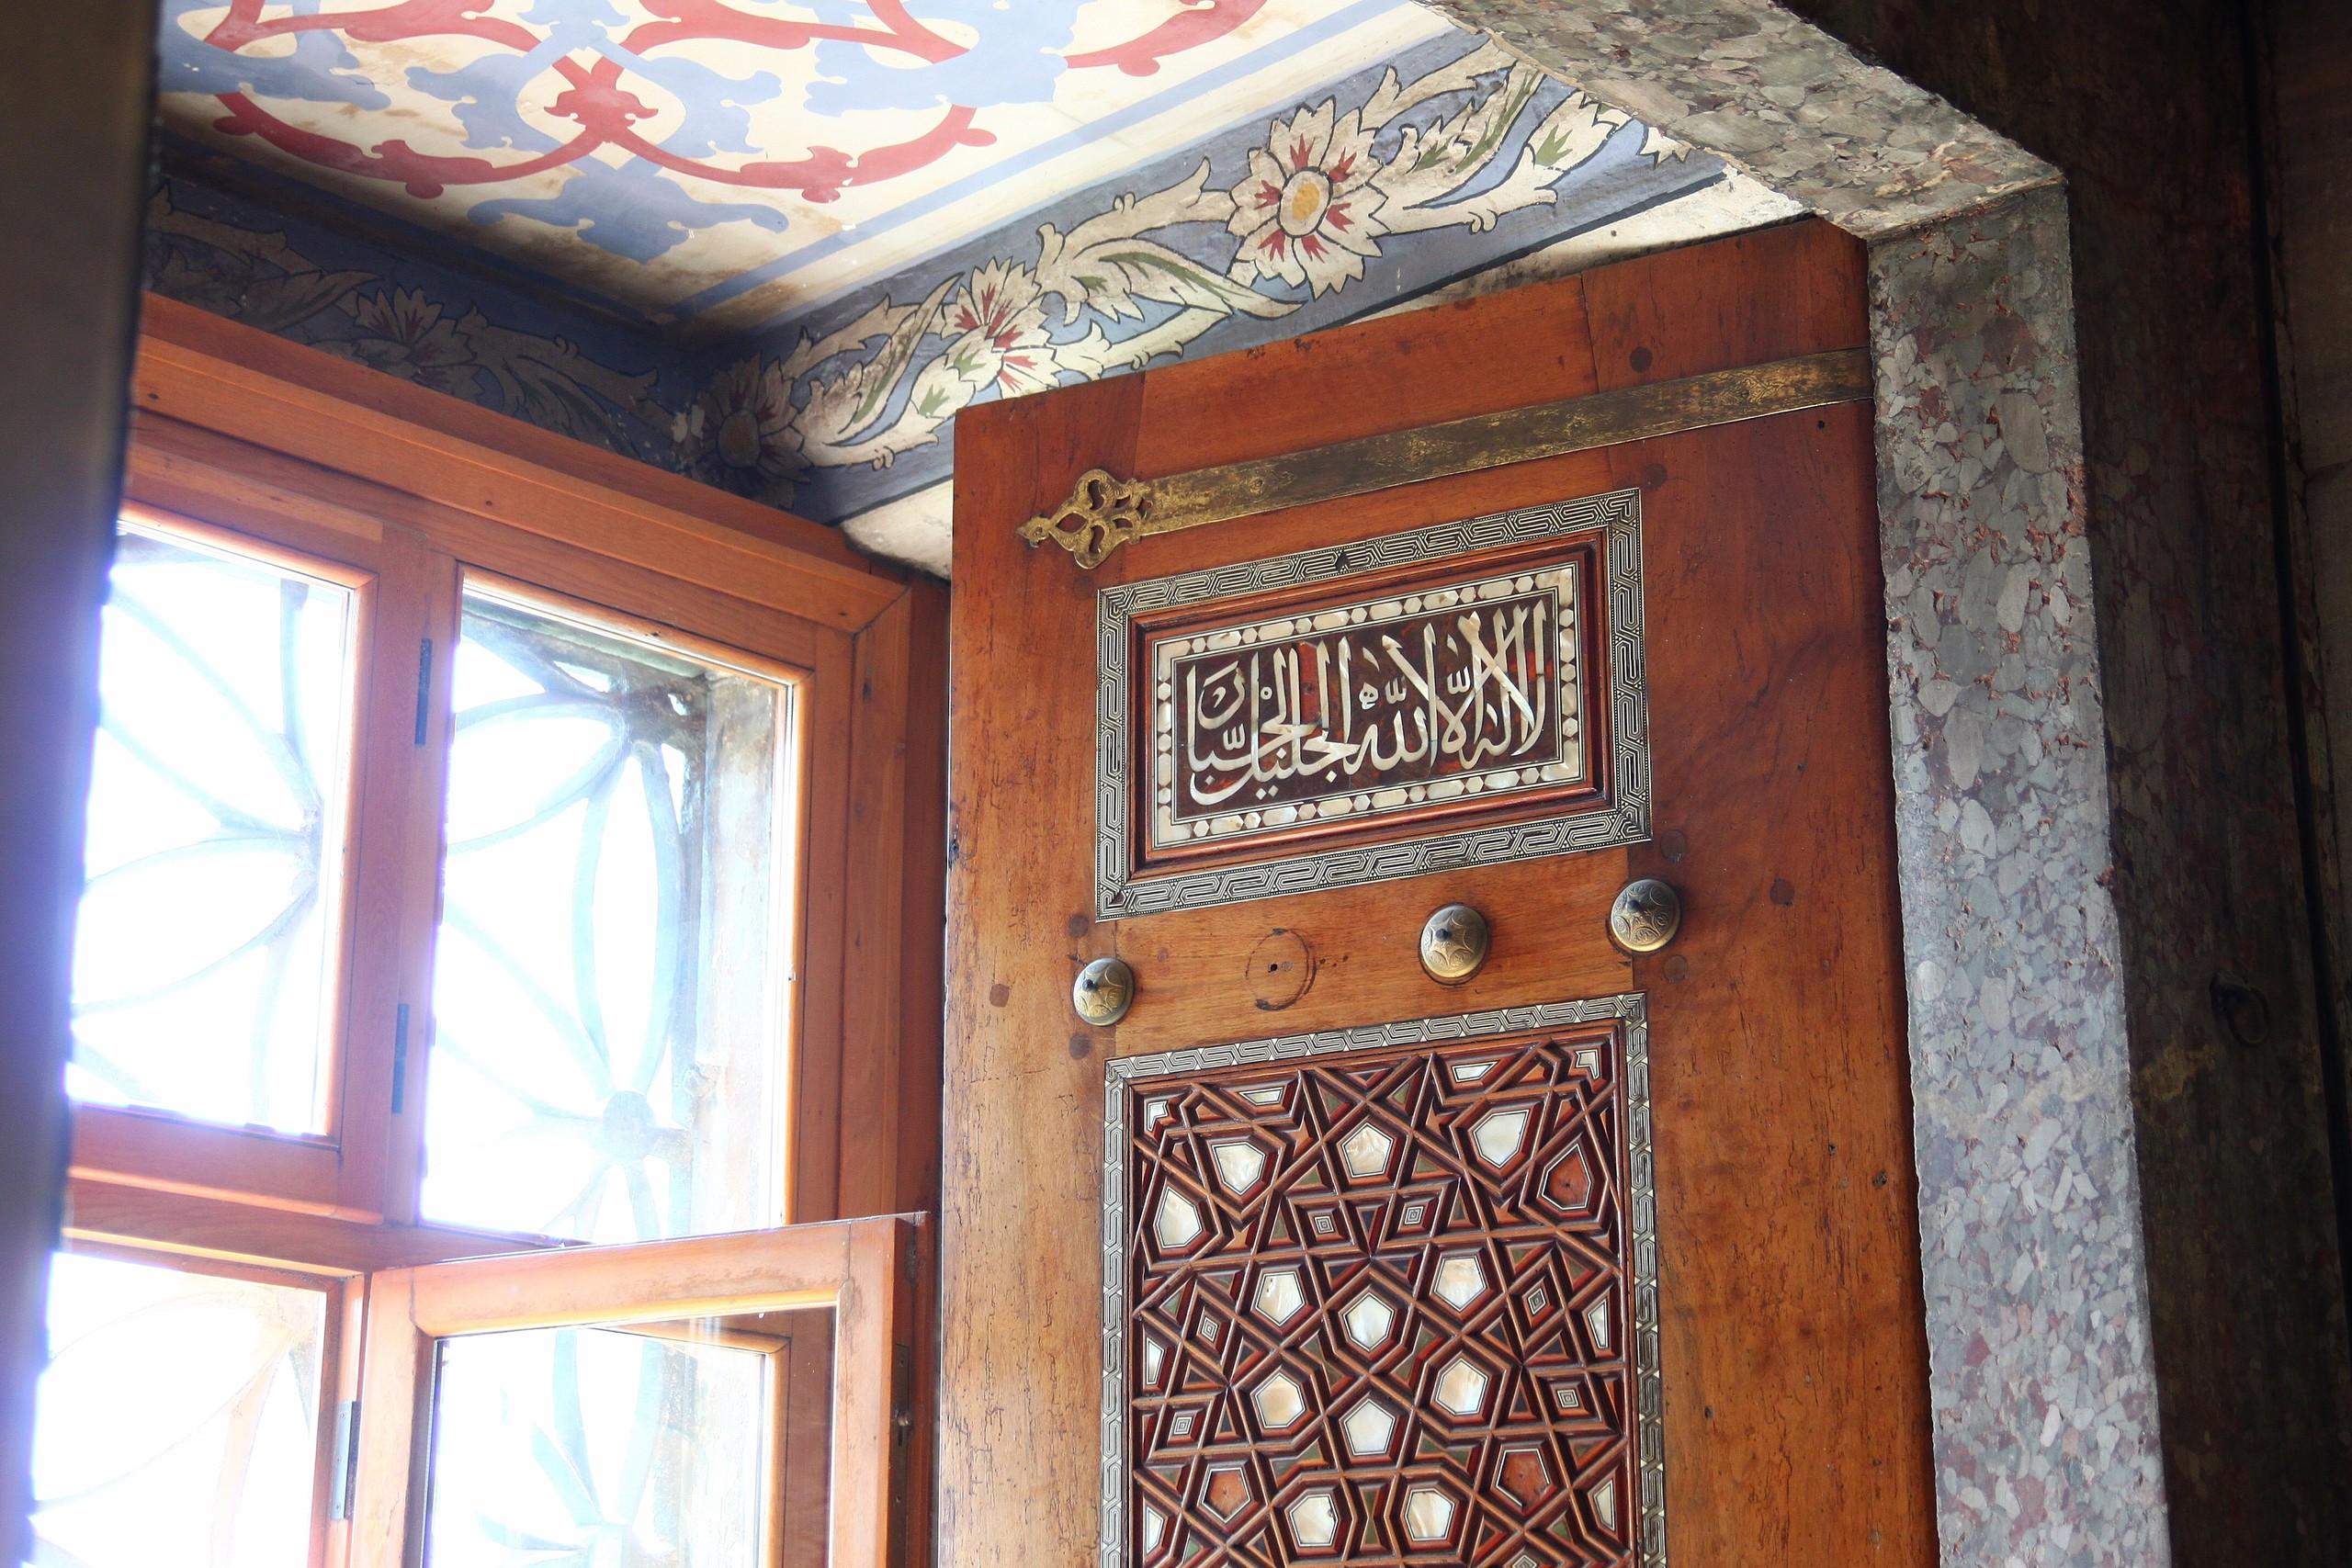 Pırlantadan Kubbeler #5: Sultanahmed - R38jNG - Pırlantadan Kubbeler #5: Sultanahmed